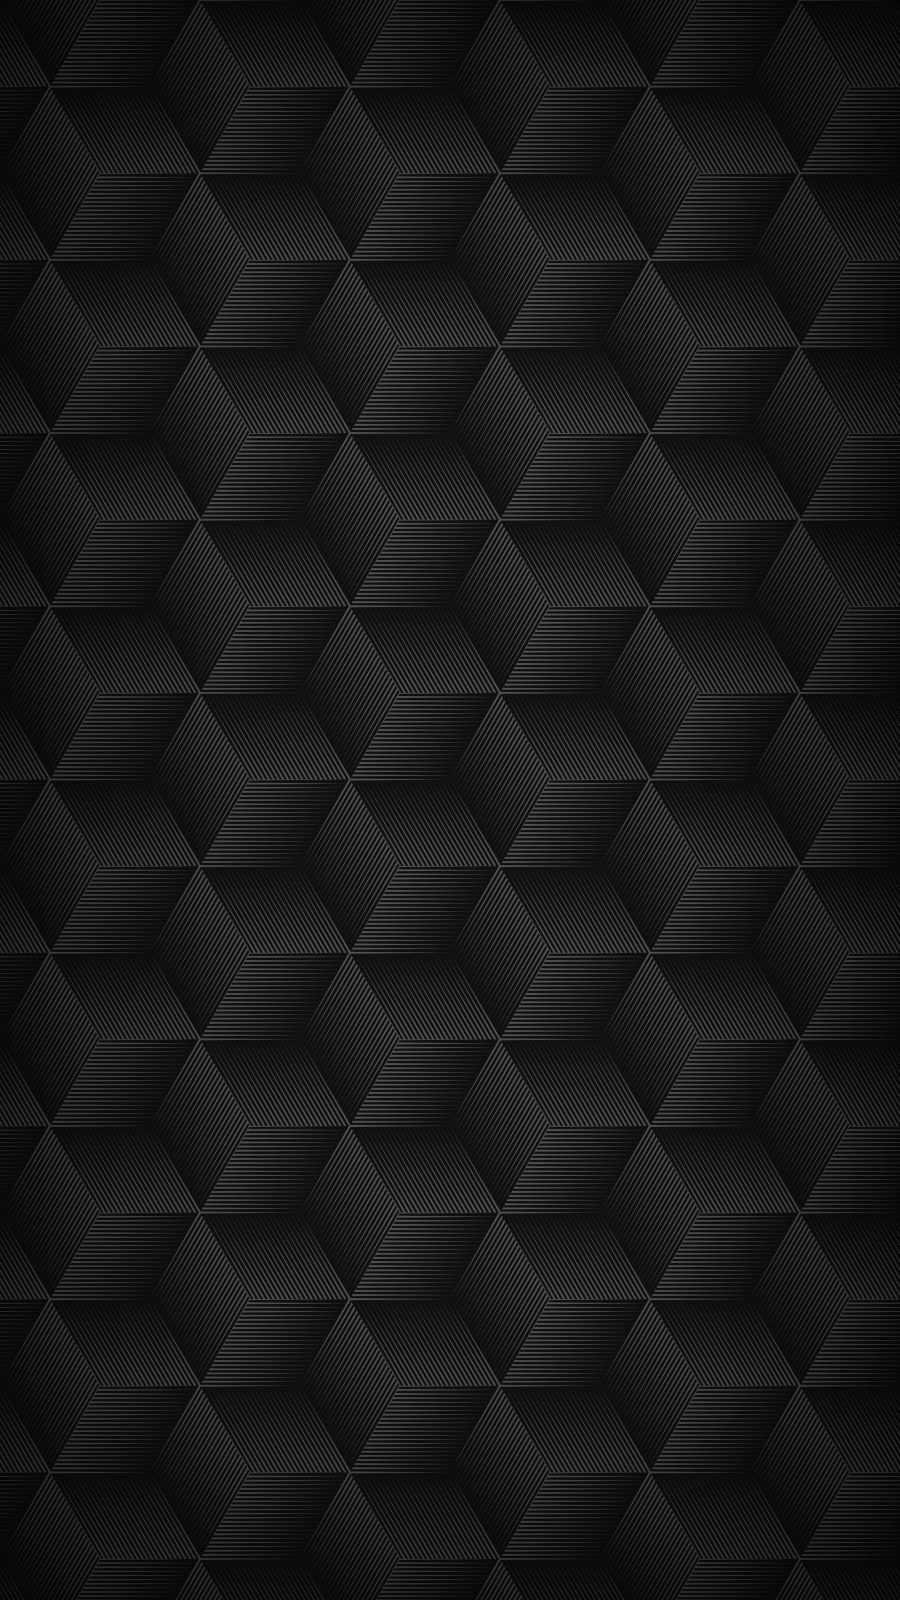 3D Cubes iPhone Wallpaper